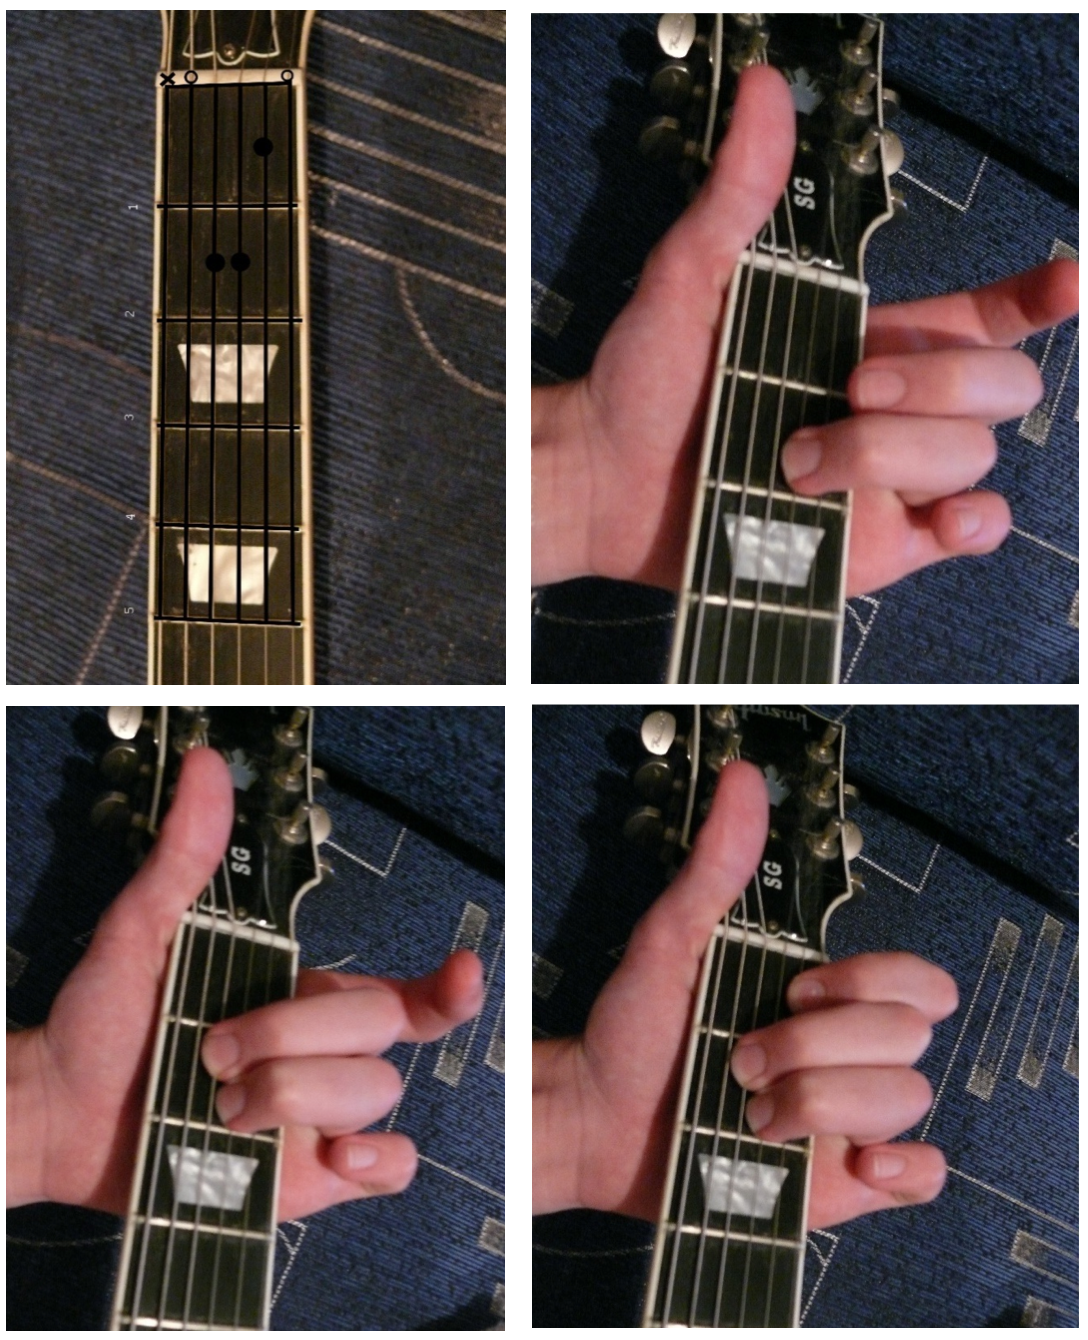 Как зажать аккорд Am на гитаре